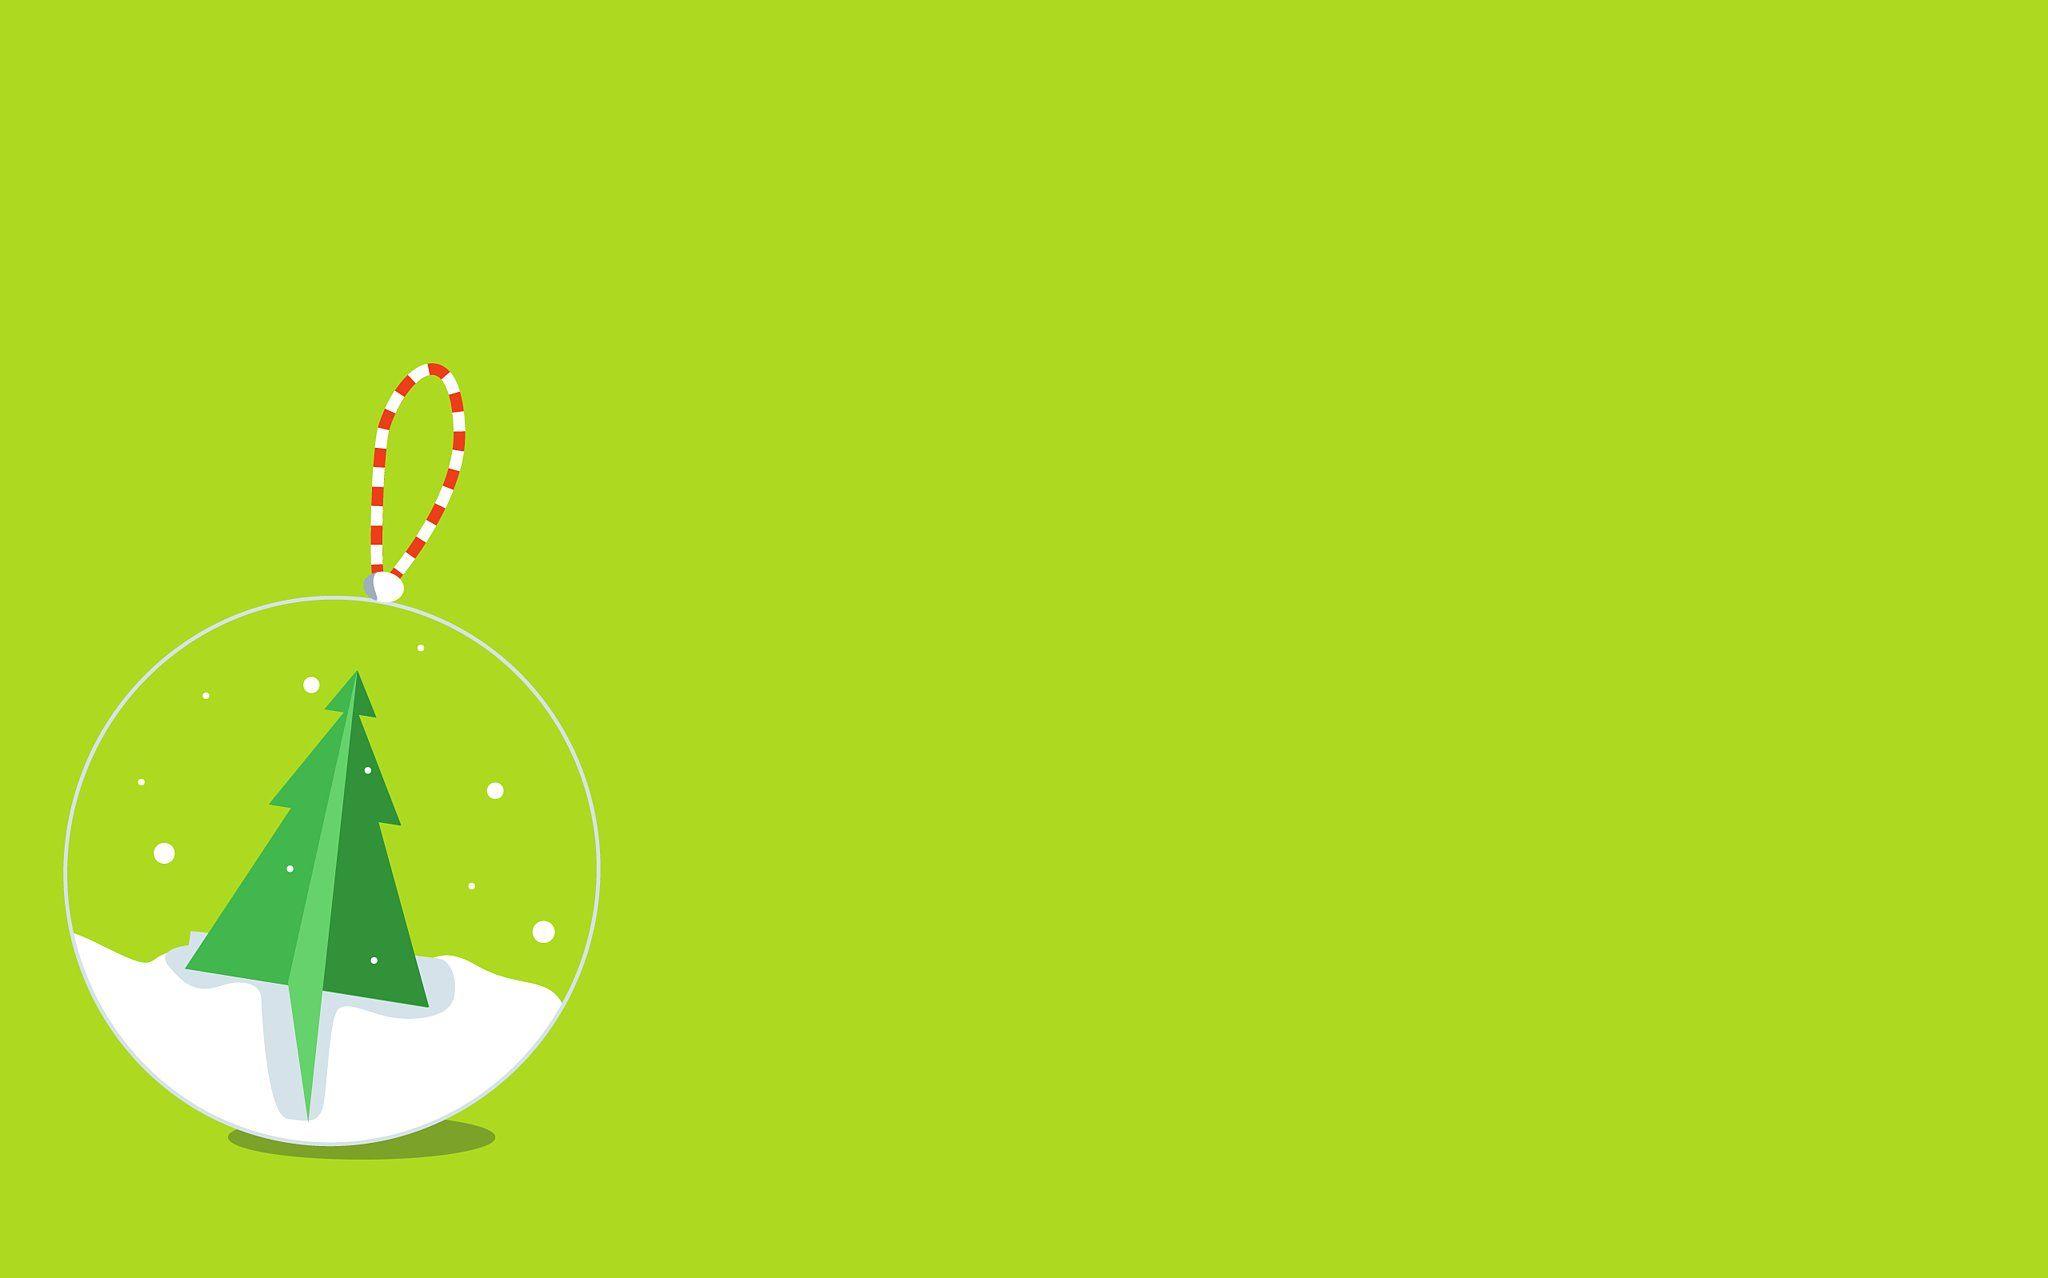 Free Holiday Desktop Wallpaper You Ll Never Want To Take Down Christmas Desktop Wallpaper Christmas Desktop Holiday Wallpaper